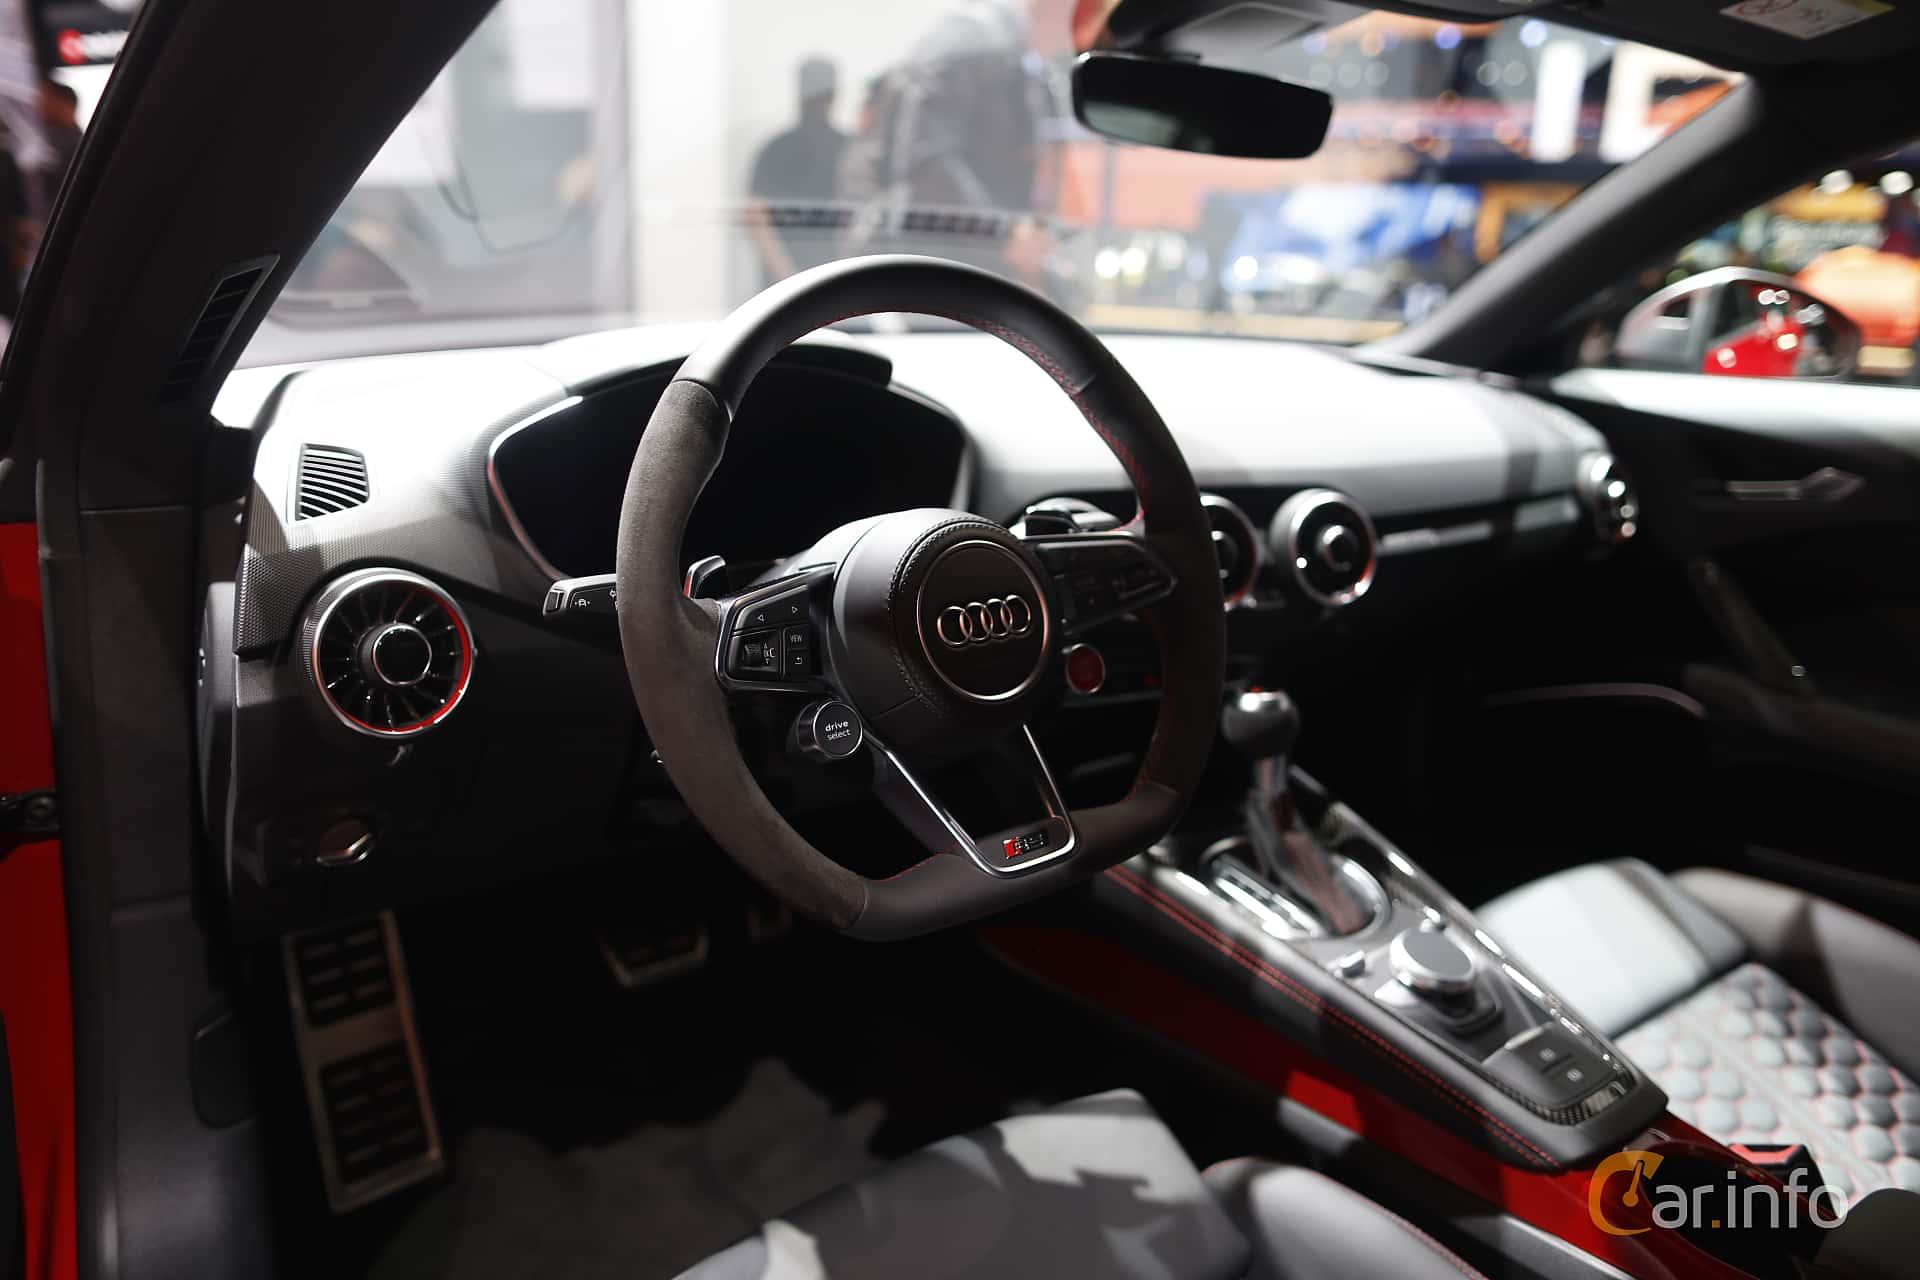 Audi Tt Rs 2020 Interior - Cars Trend Today